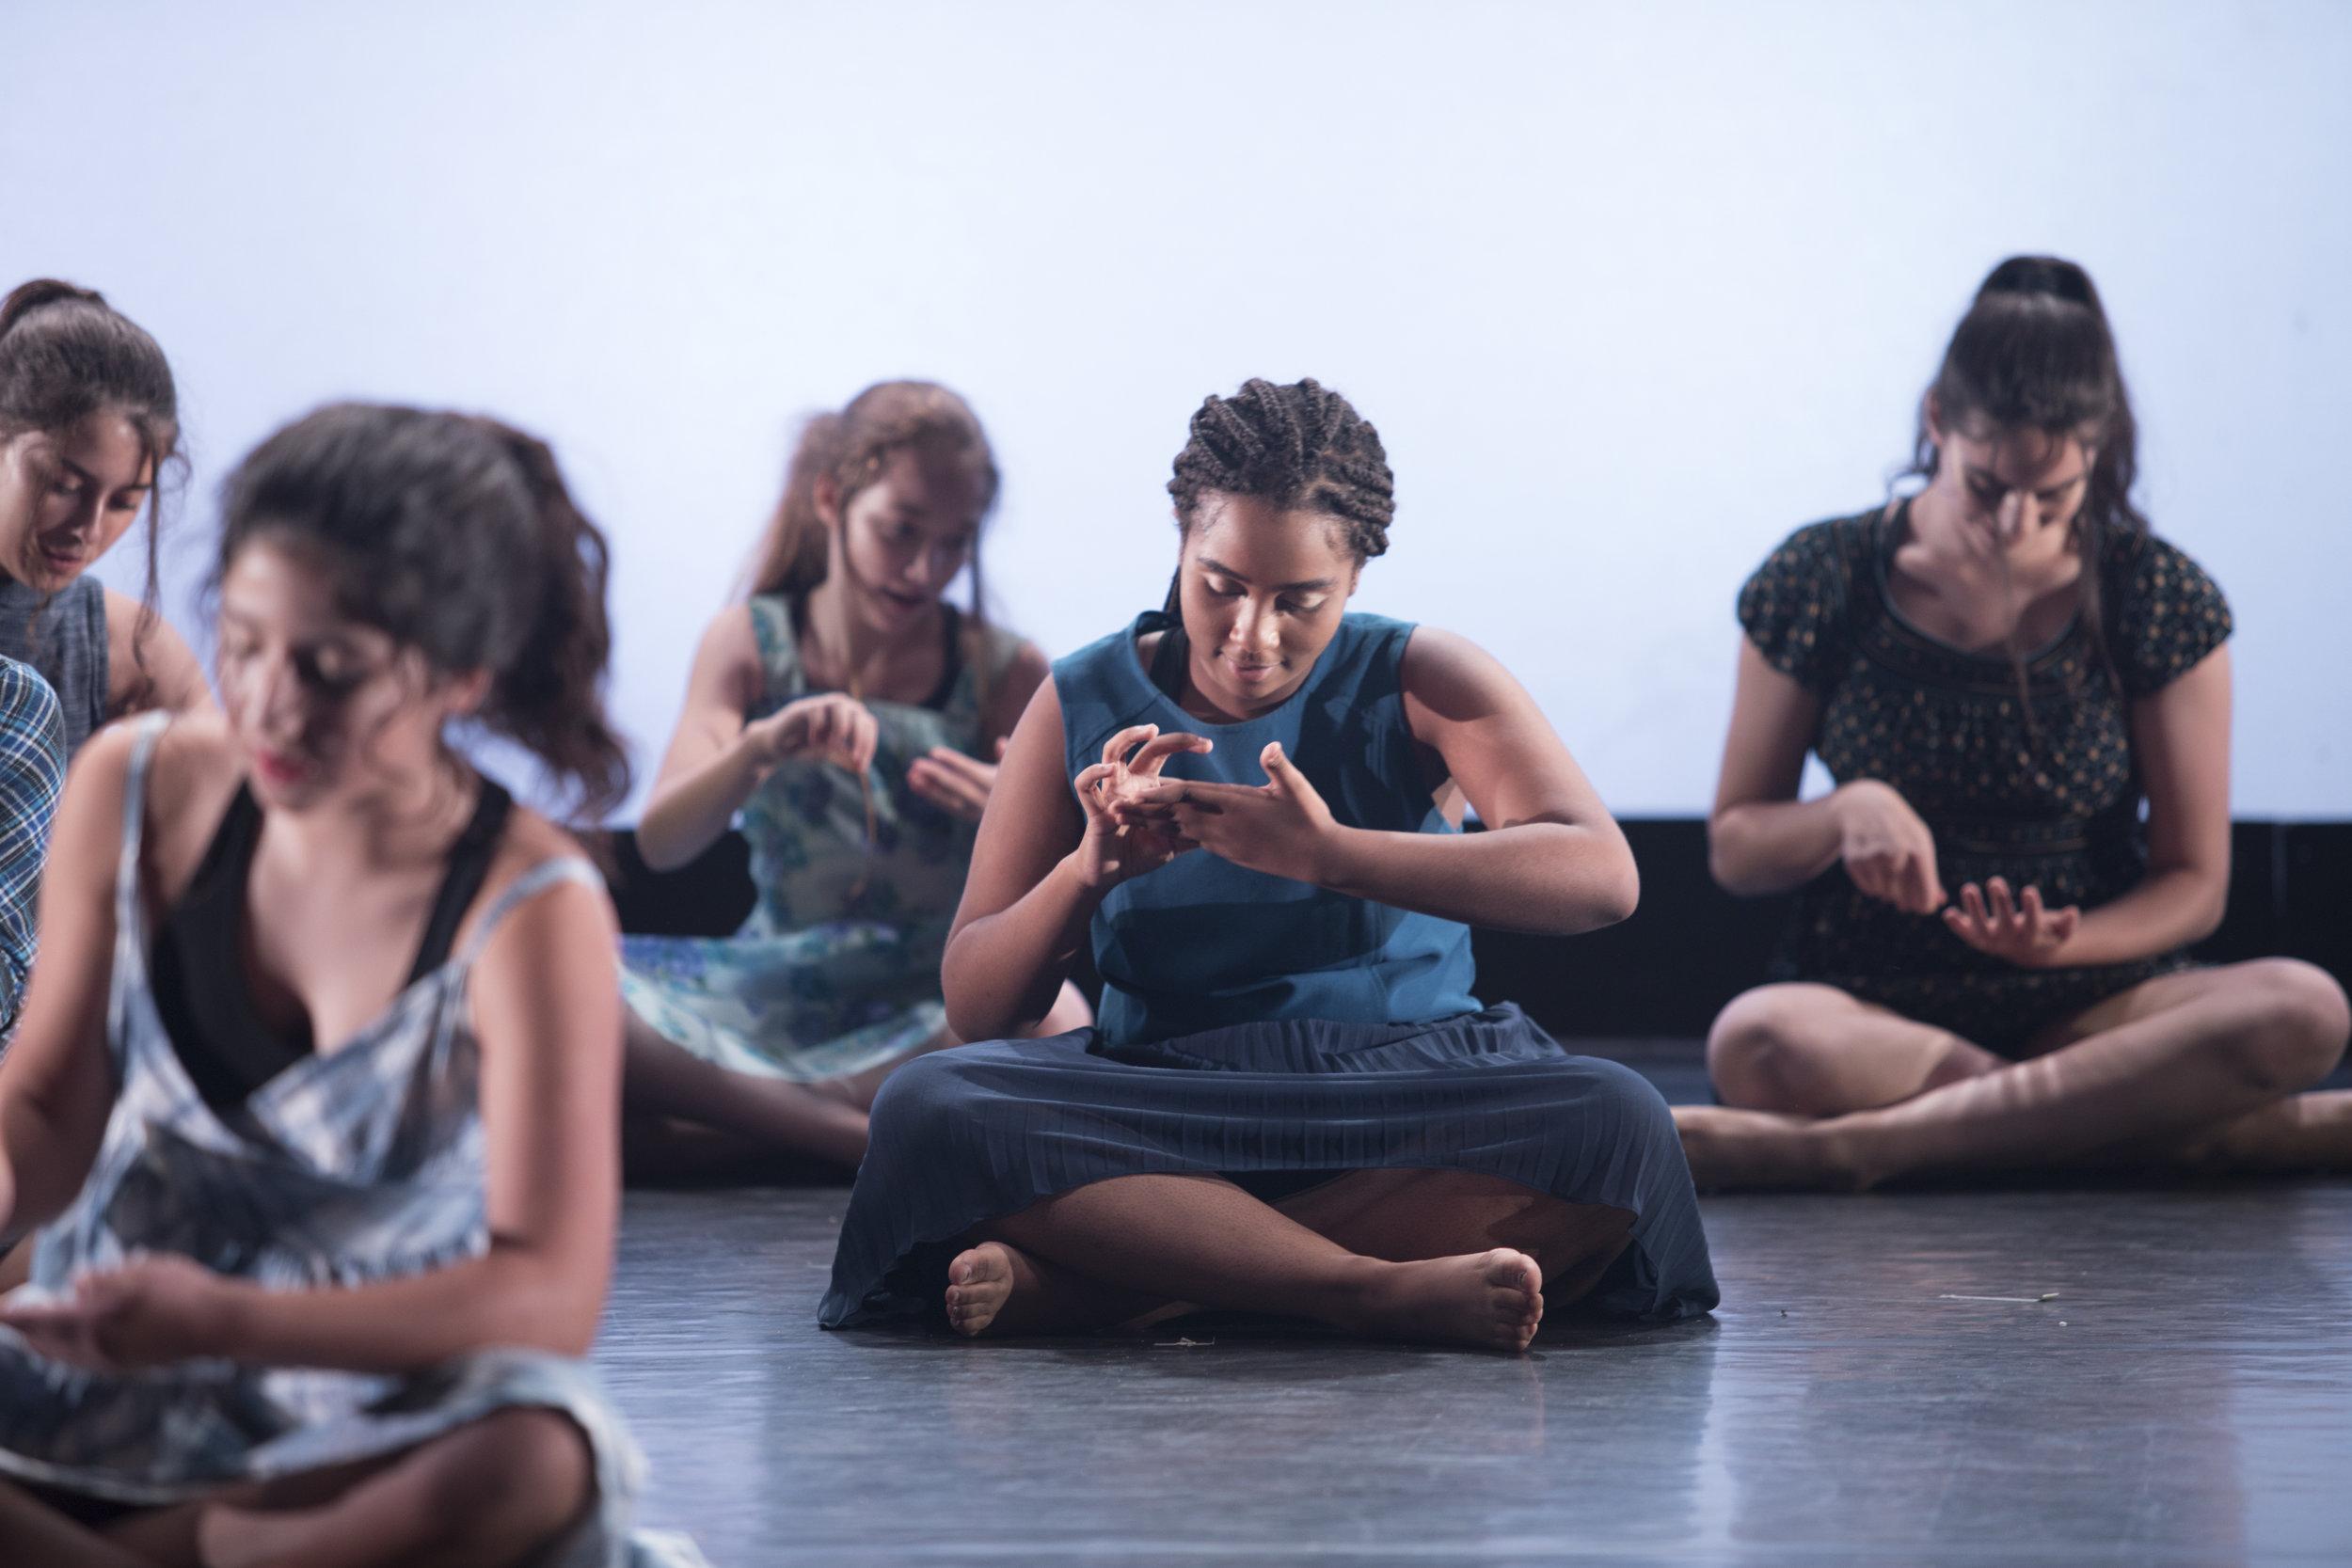 Dance Show by Jehanne-Marie Milne-43.jpg